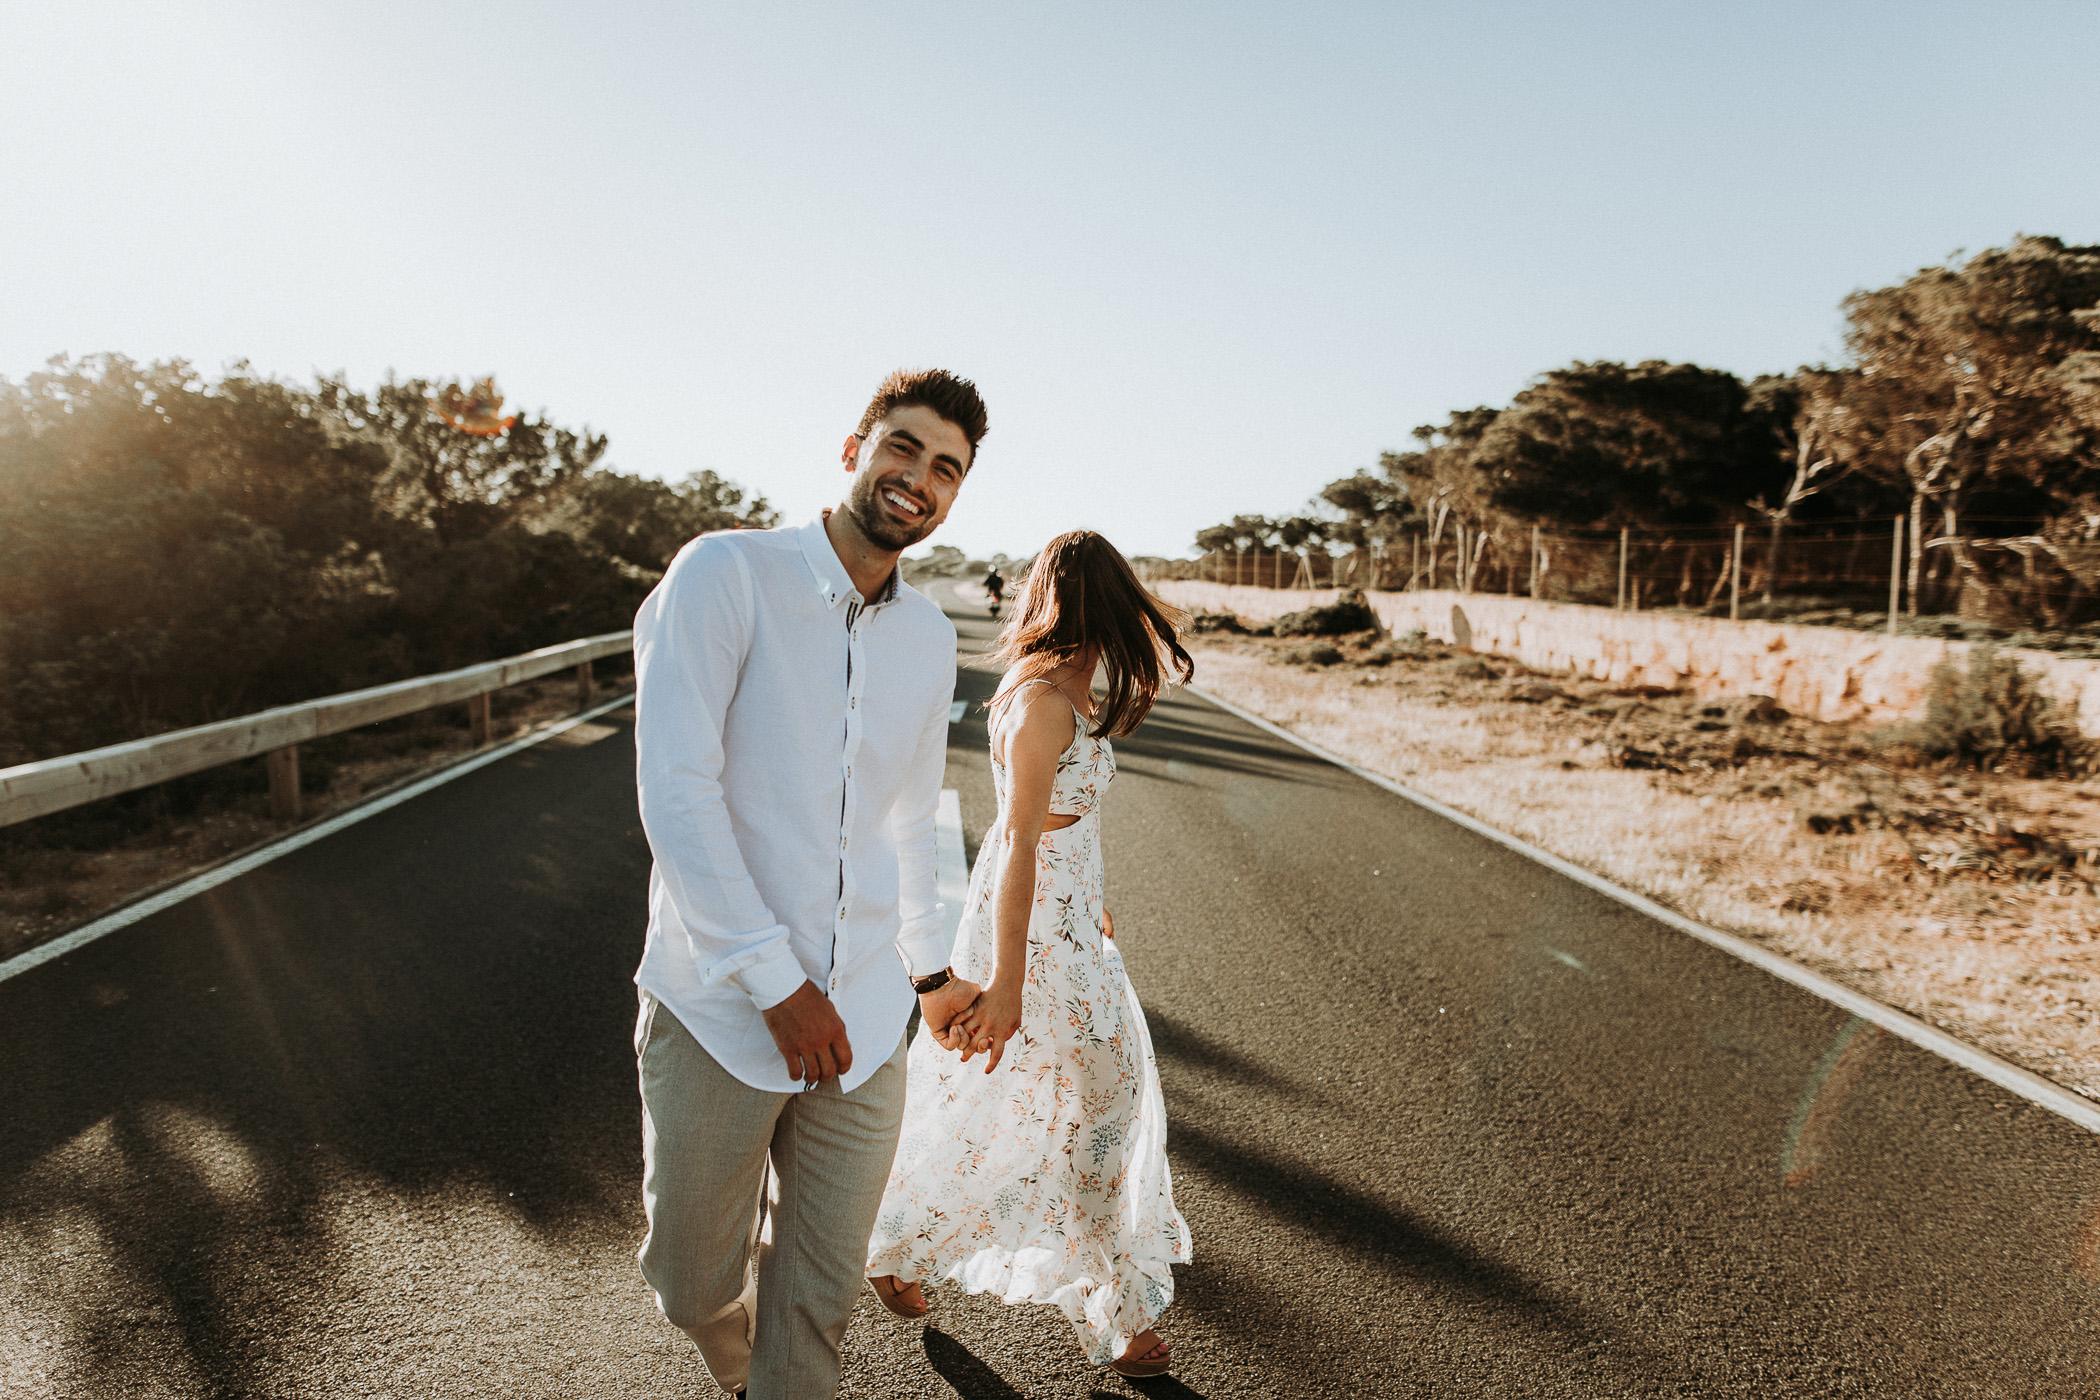 DanielaMarquardtPhotography_wedding_elopement_mallorca_spain_calapi_palma_lauraandtoni_412